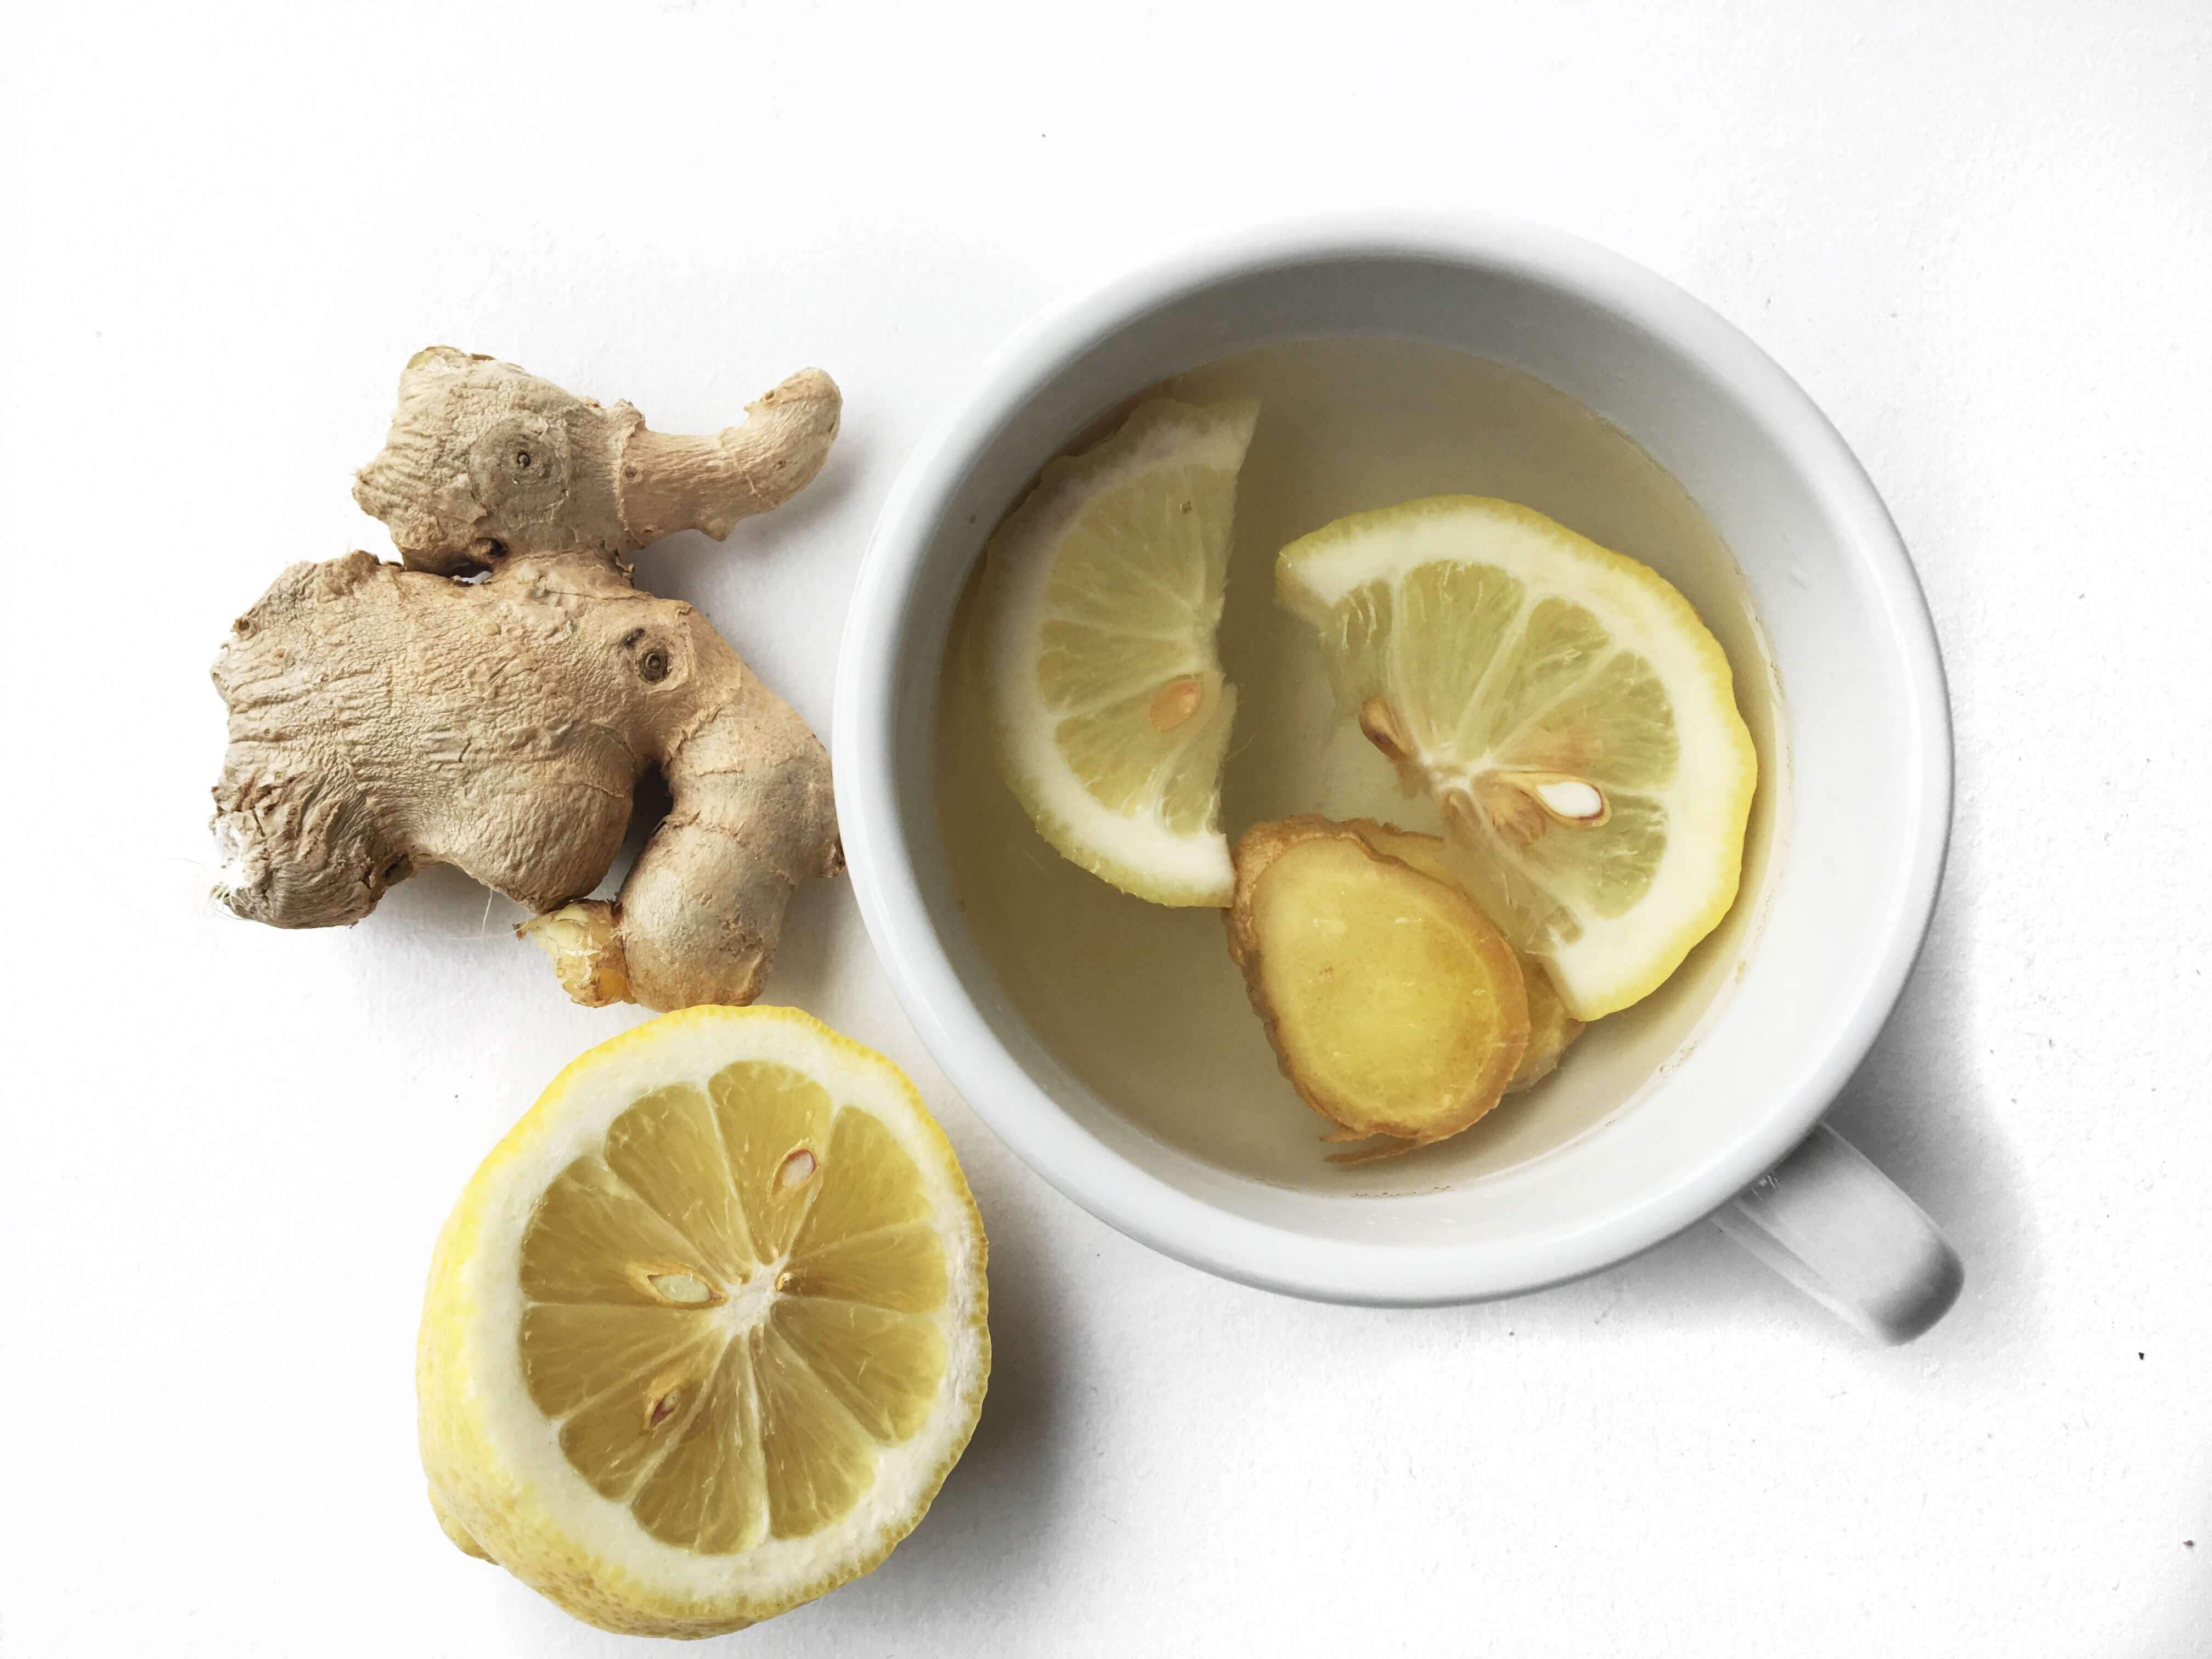 heisse-zitrone-fitnessblogger-gesundheit-cleaneating-herbst-must-haves